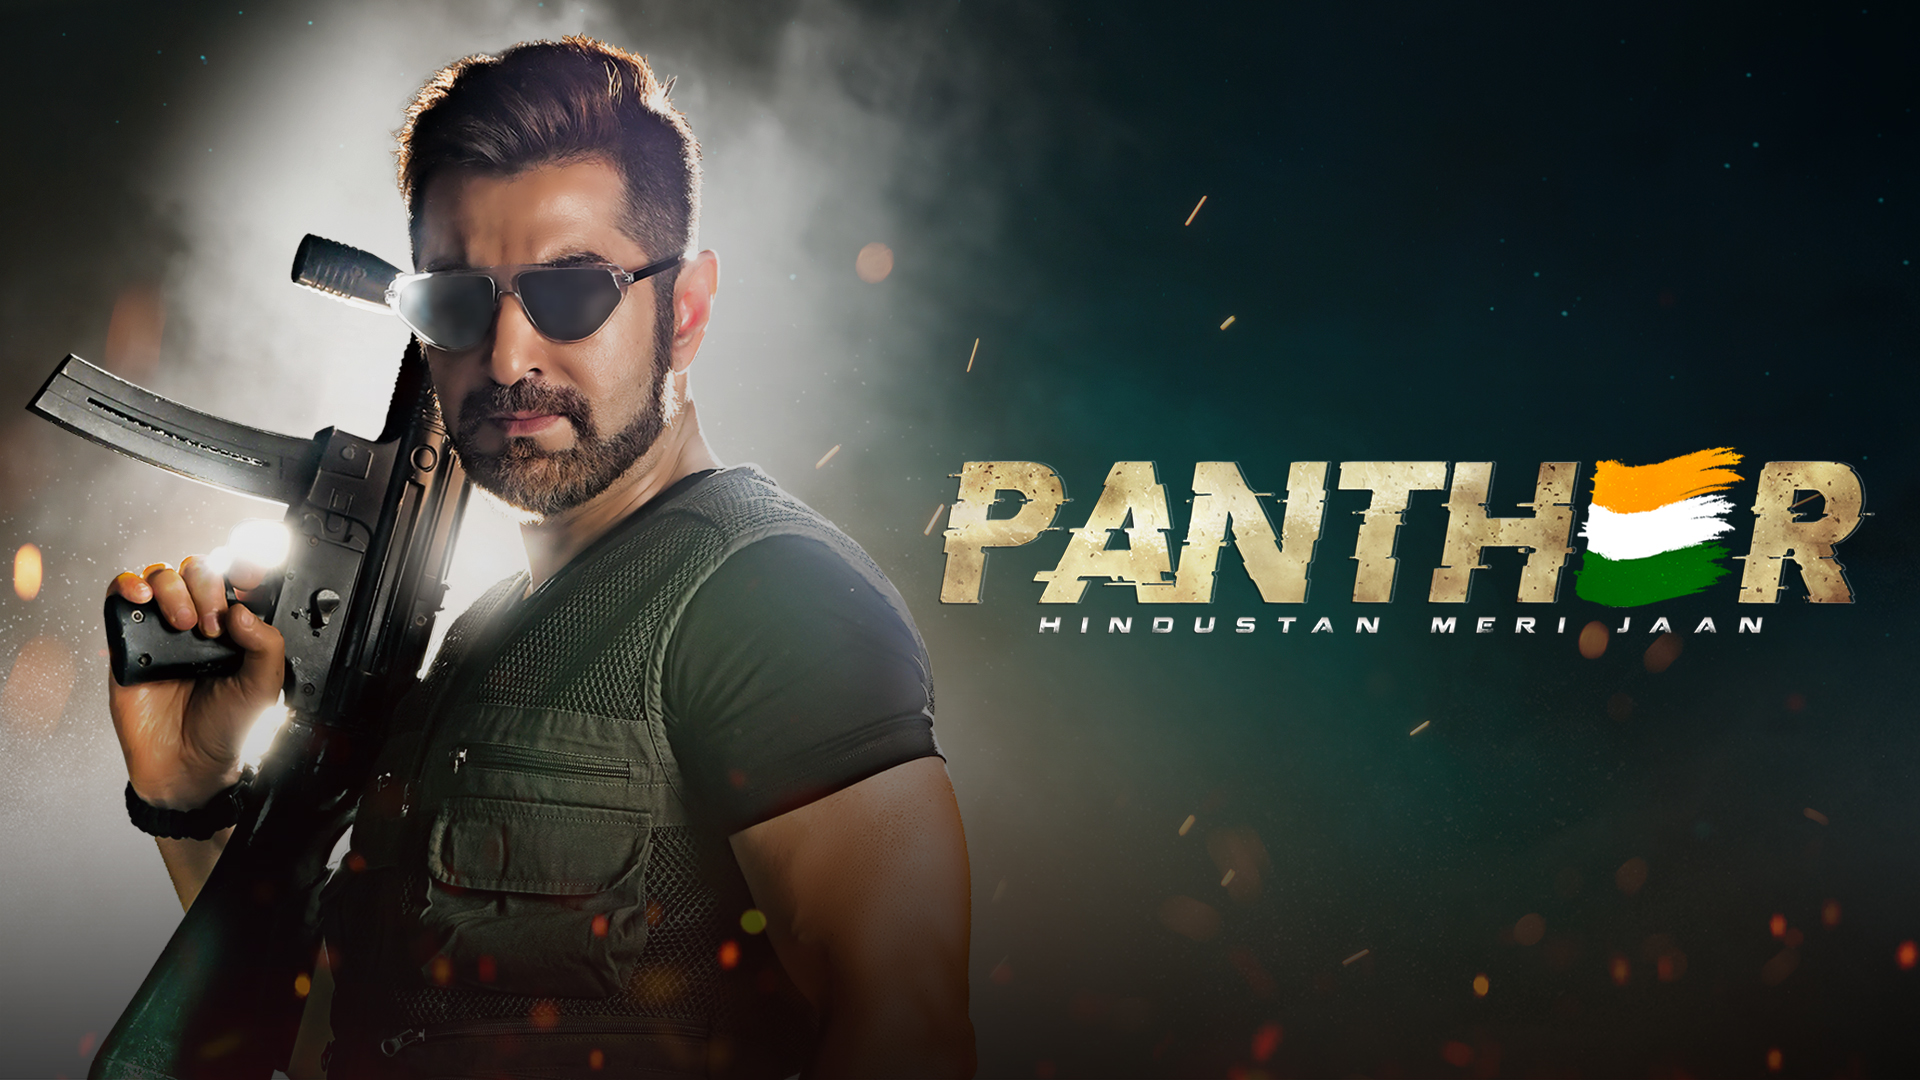 Panther - Hindustan Meri Jaan